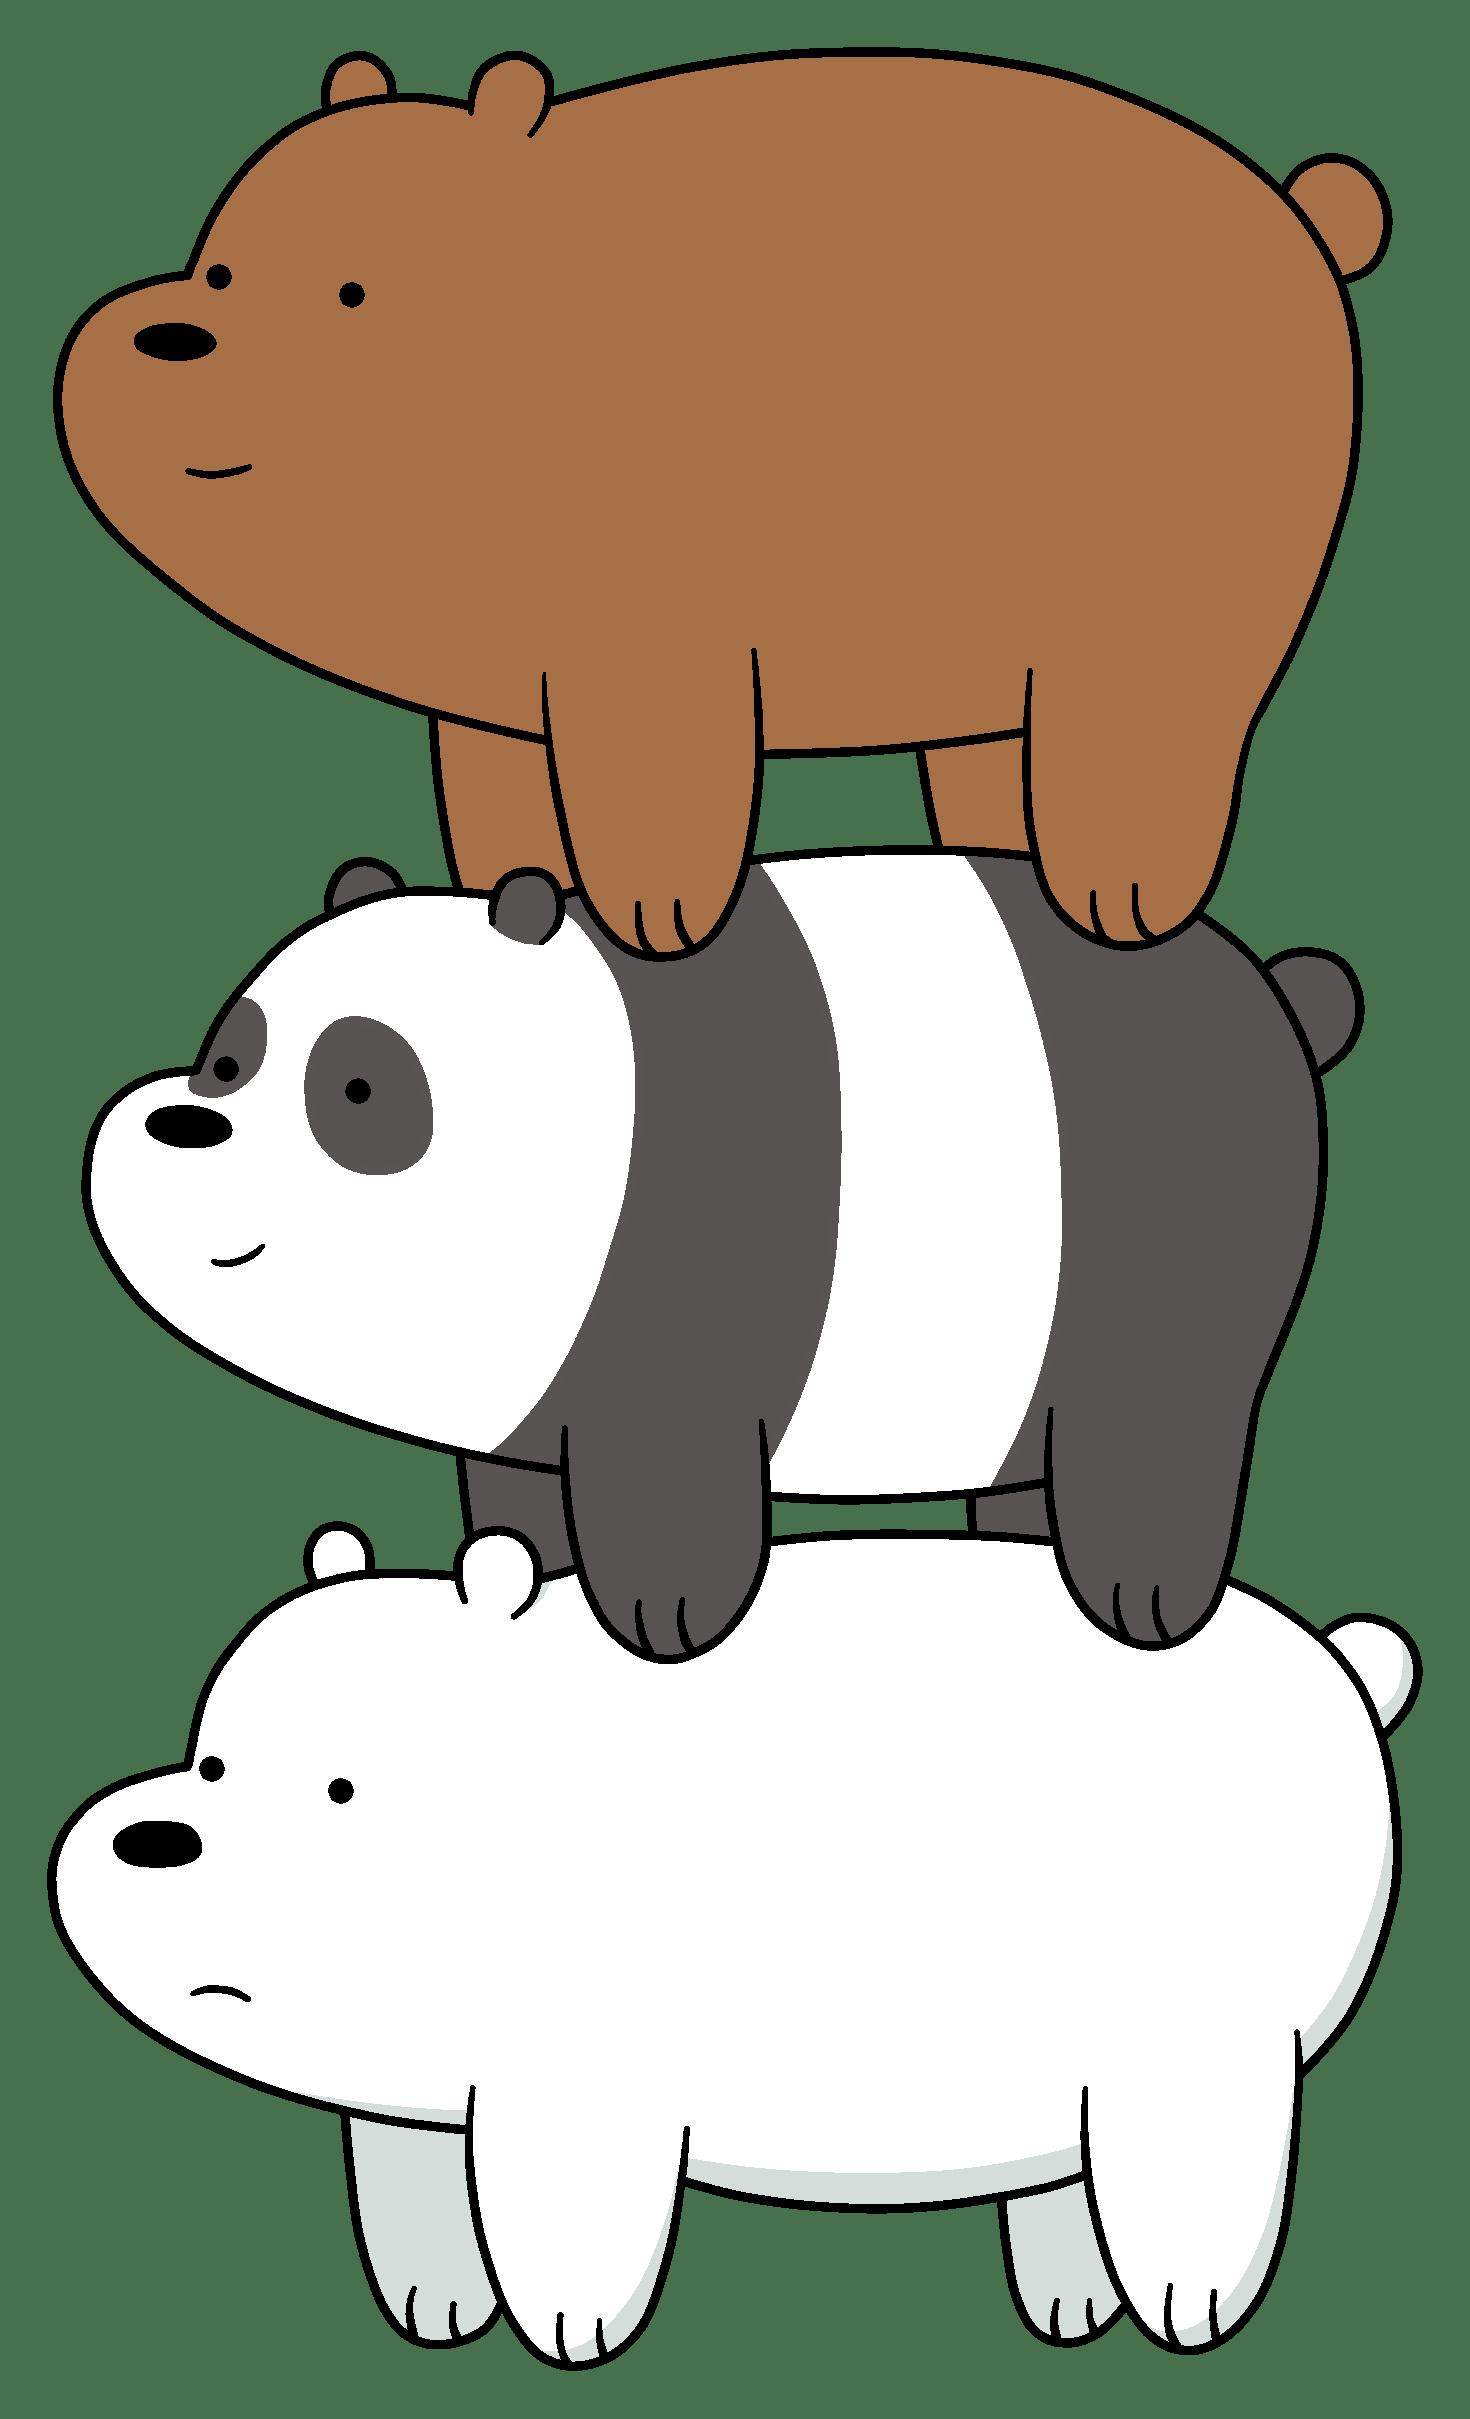 Gravity Falls Wallpaper Phone Hd Bear Stack We Bare Bears Wiki Fandom Powered By Wikia